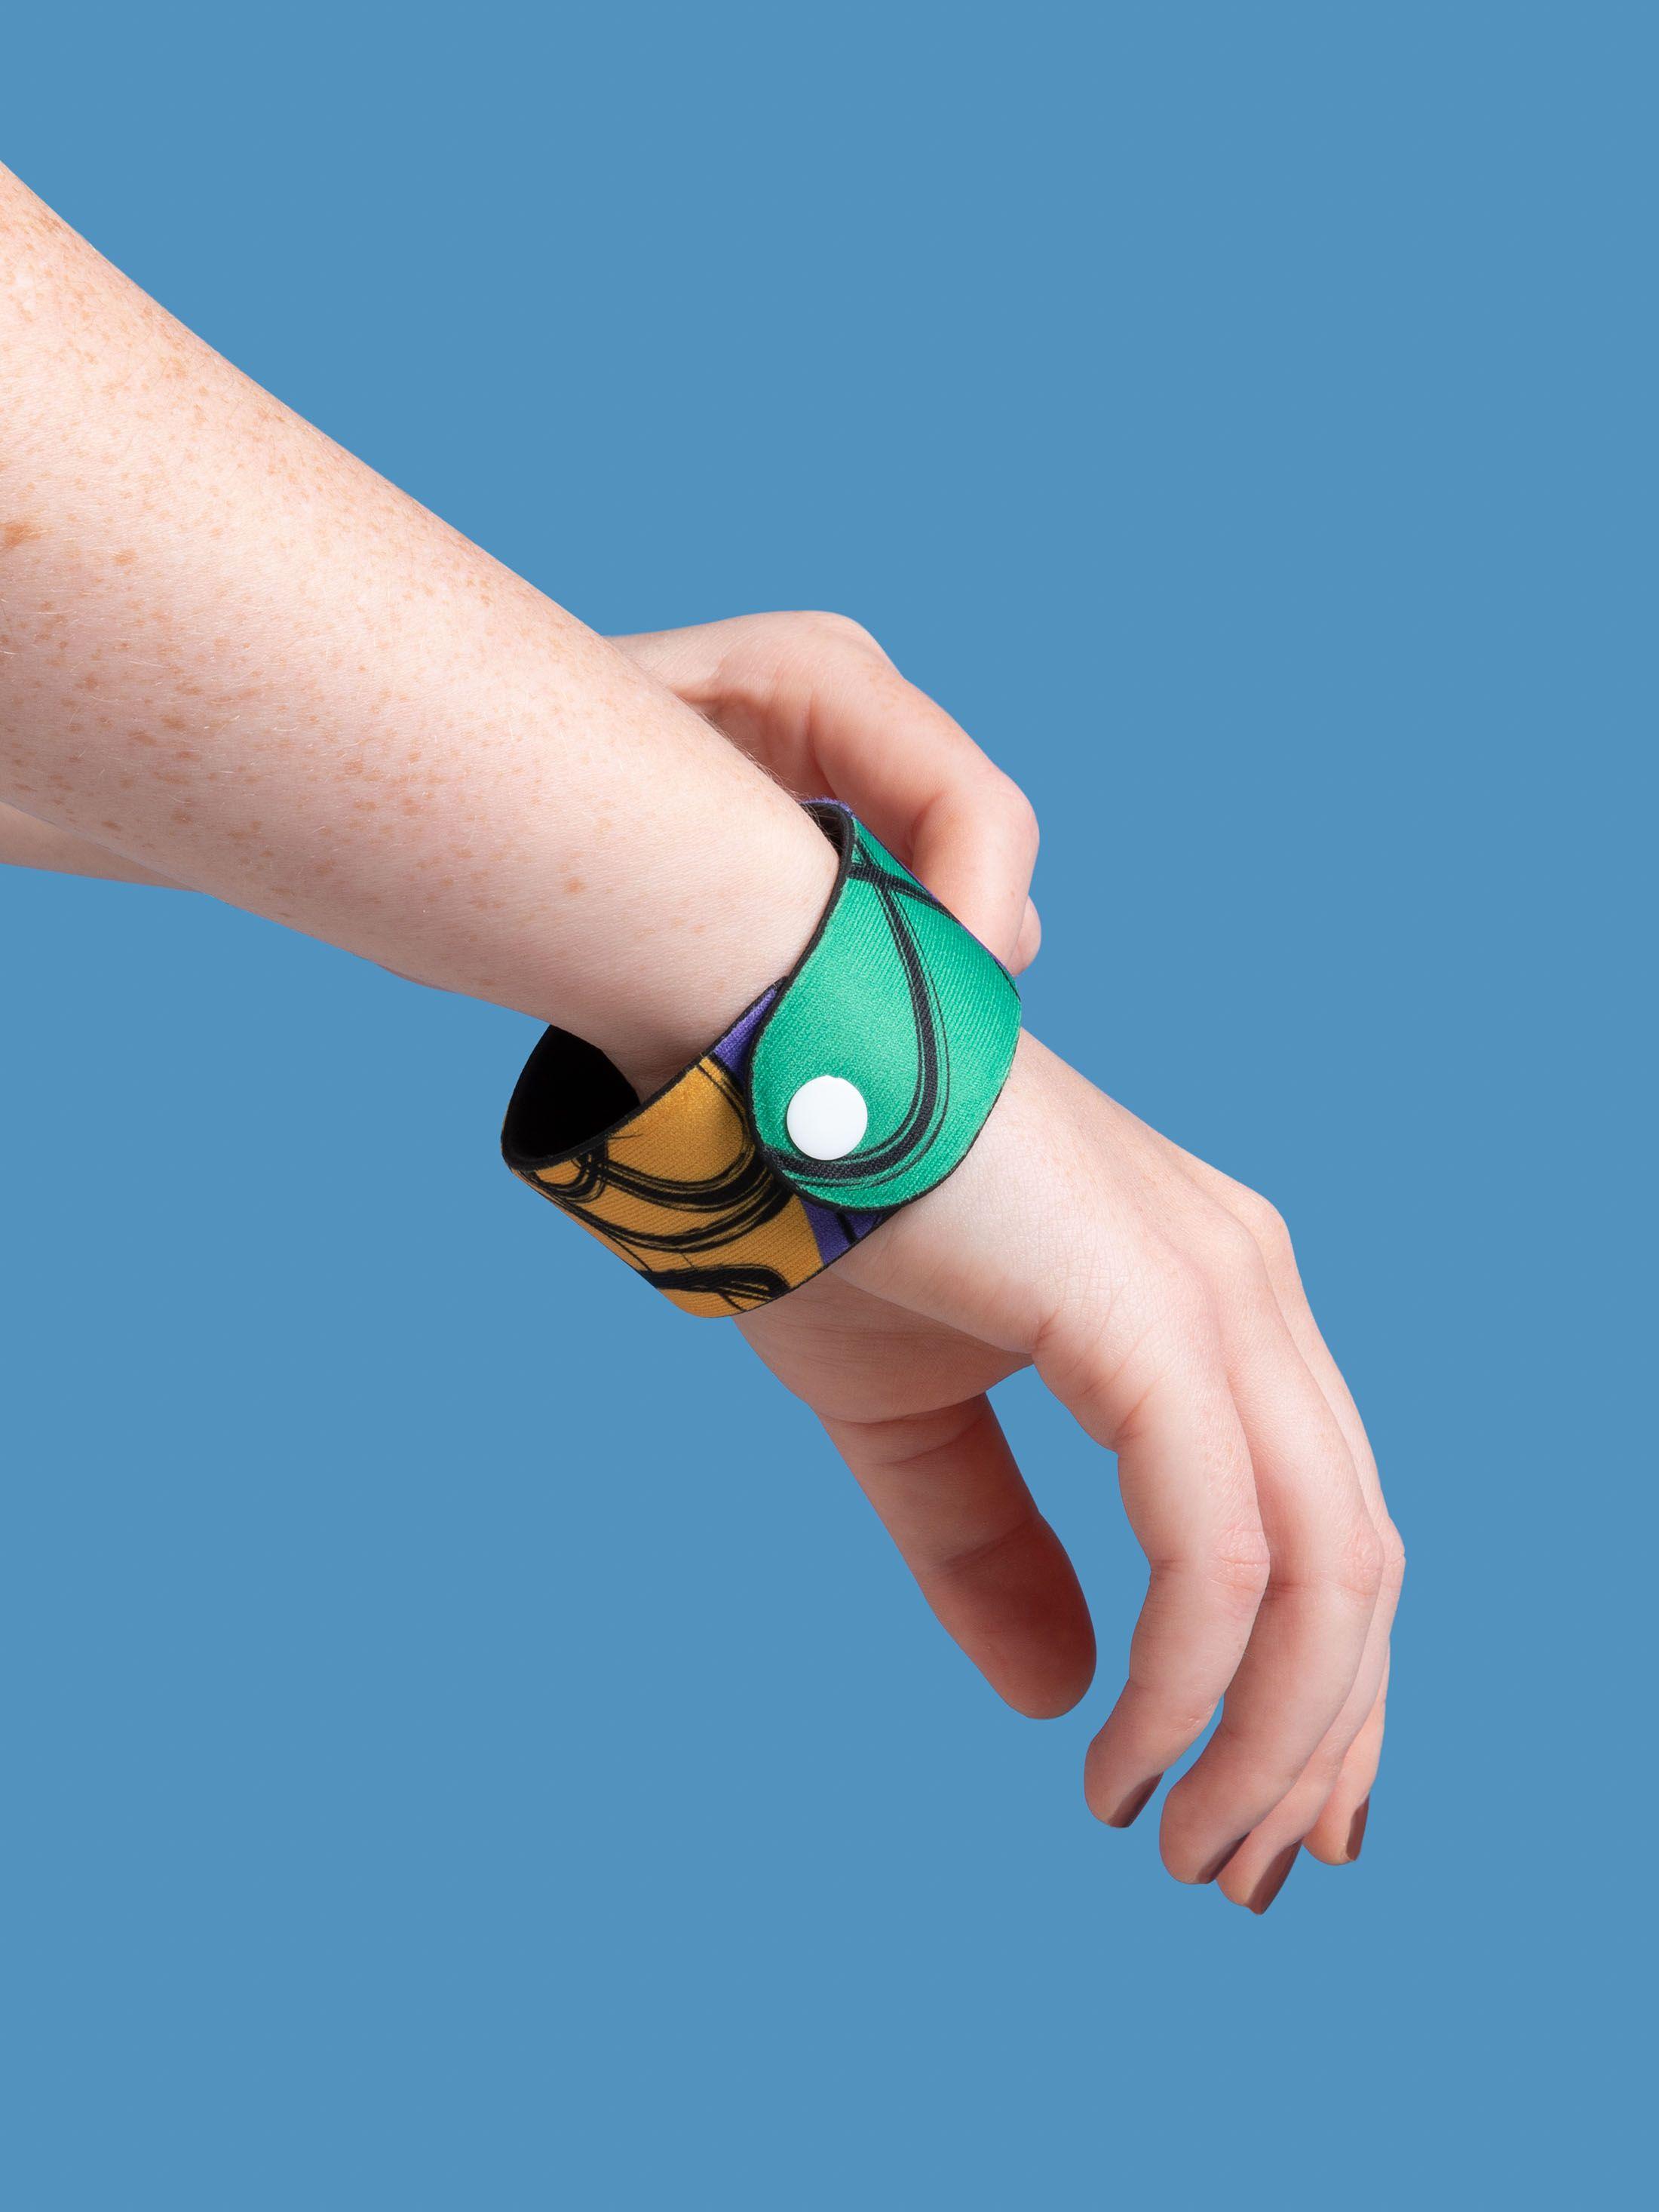 armband designen mit muster